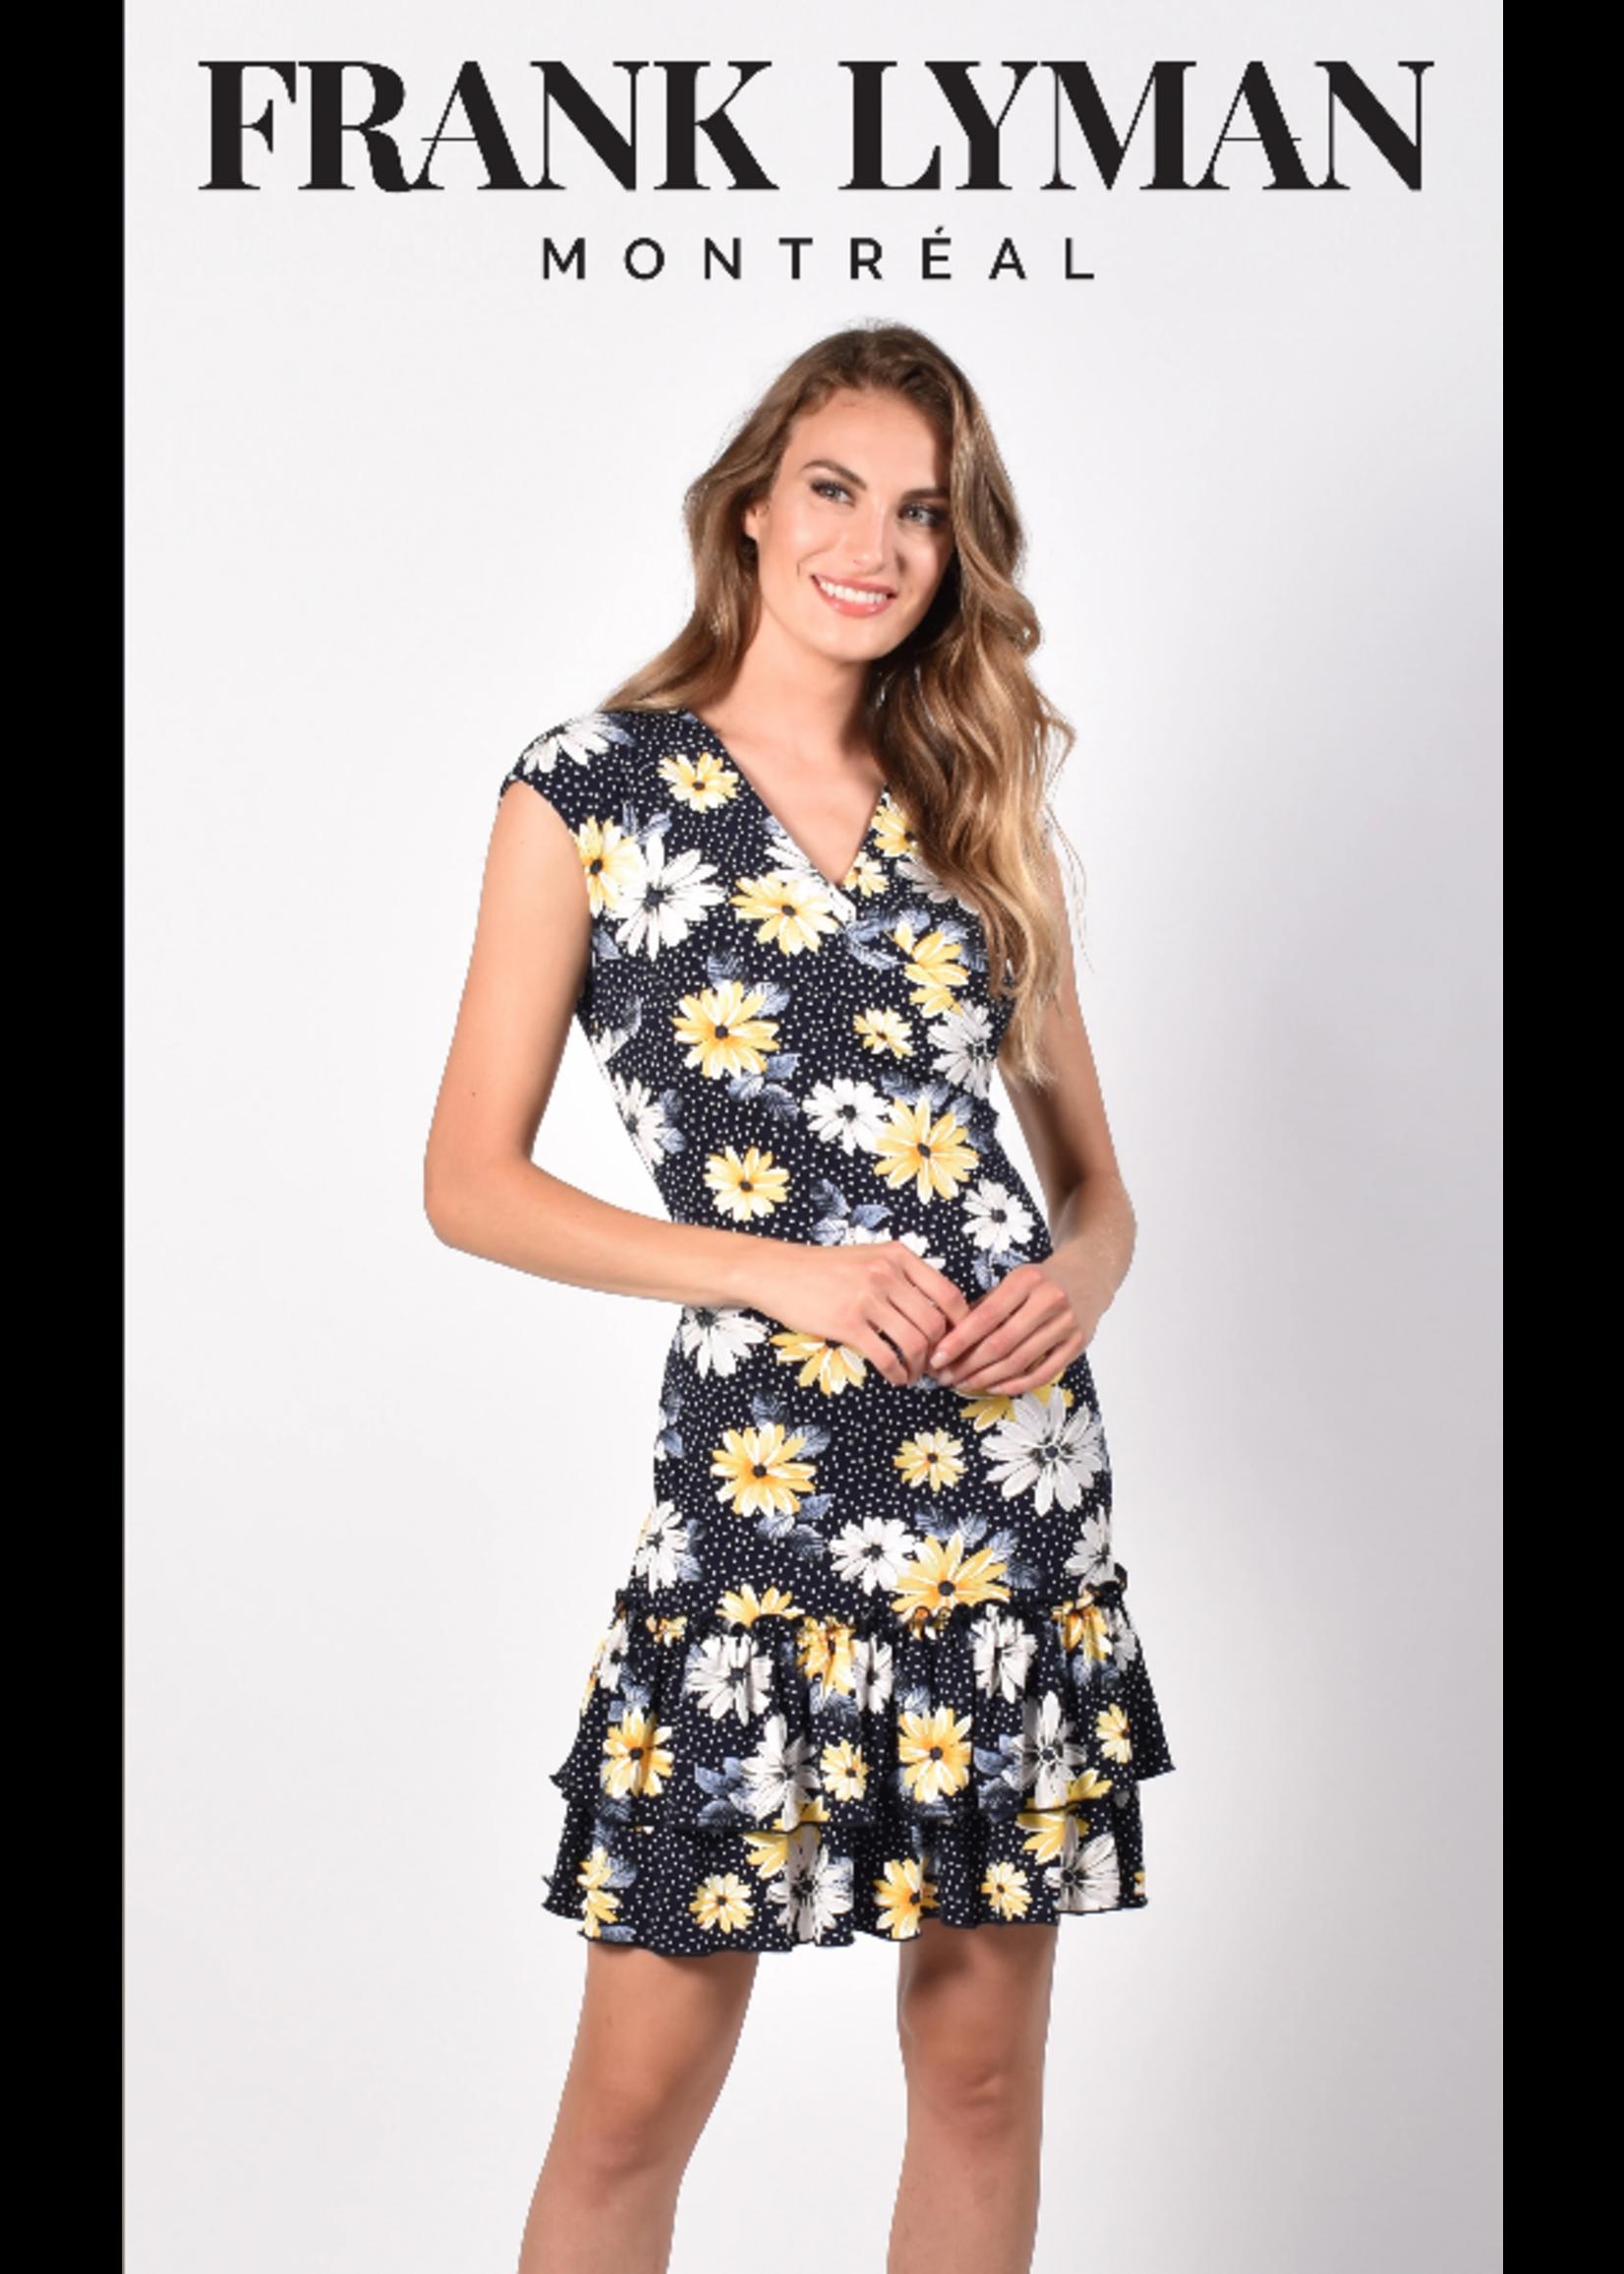 Frank Lyman Sunflower Dress